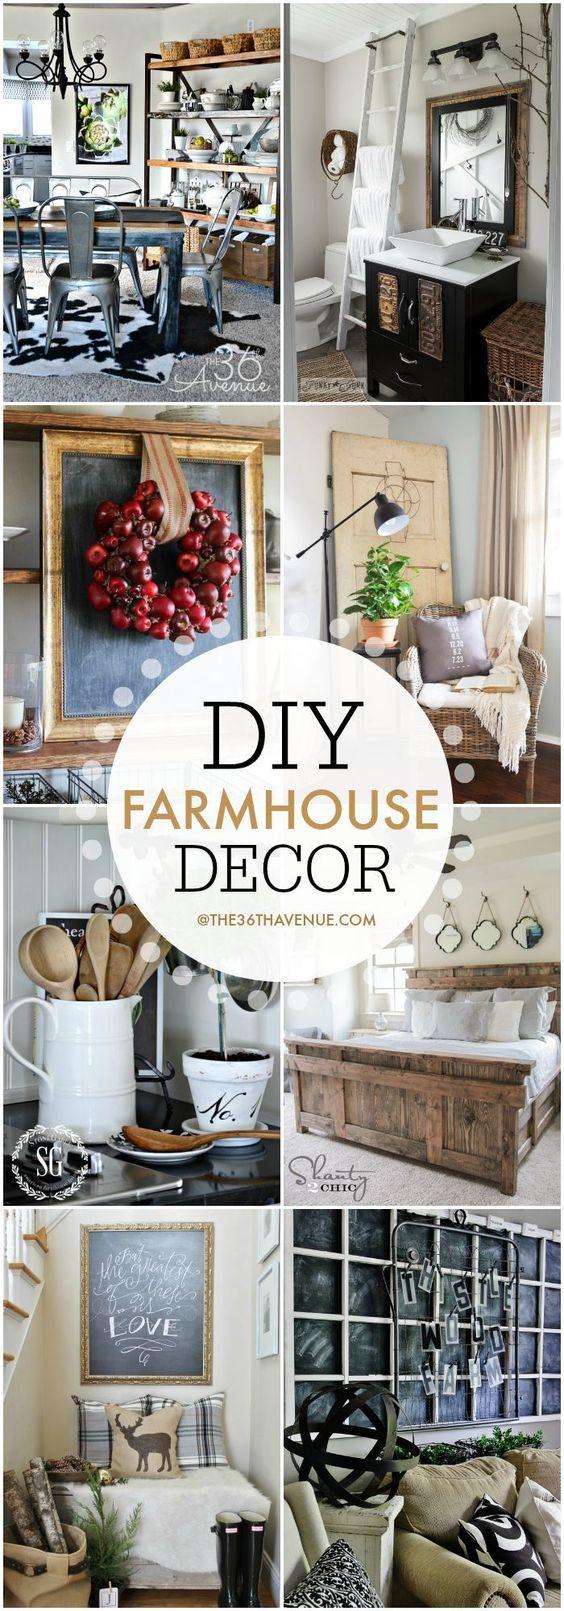 Home Decor - DIY Farmhouse Decor Ideas at the36thavenue.com Super cute ways to decorate your home!